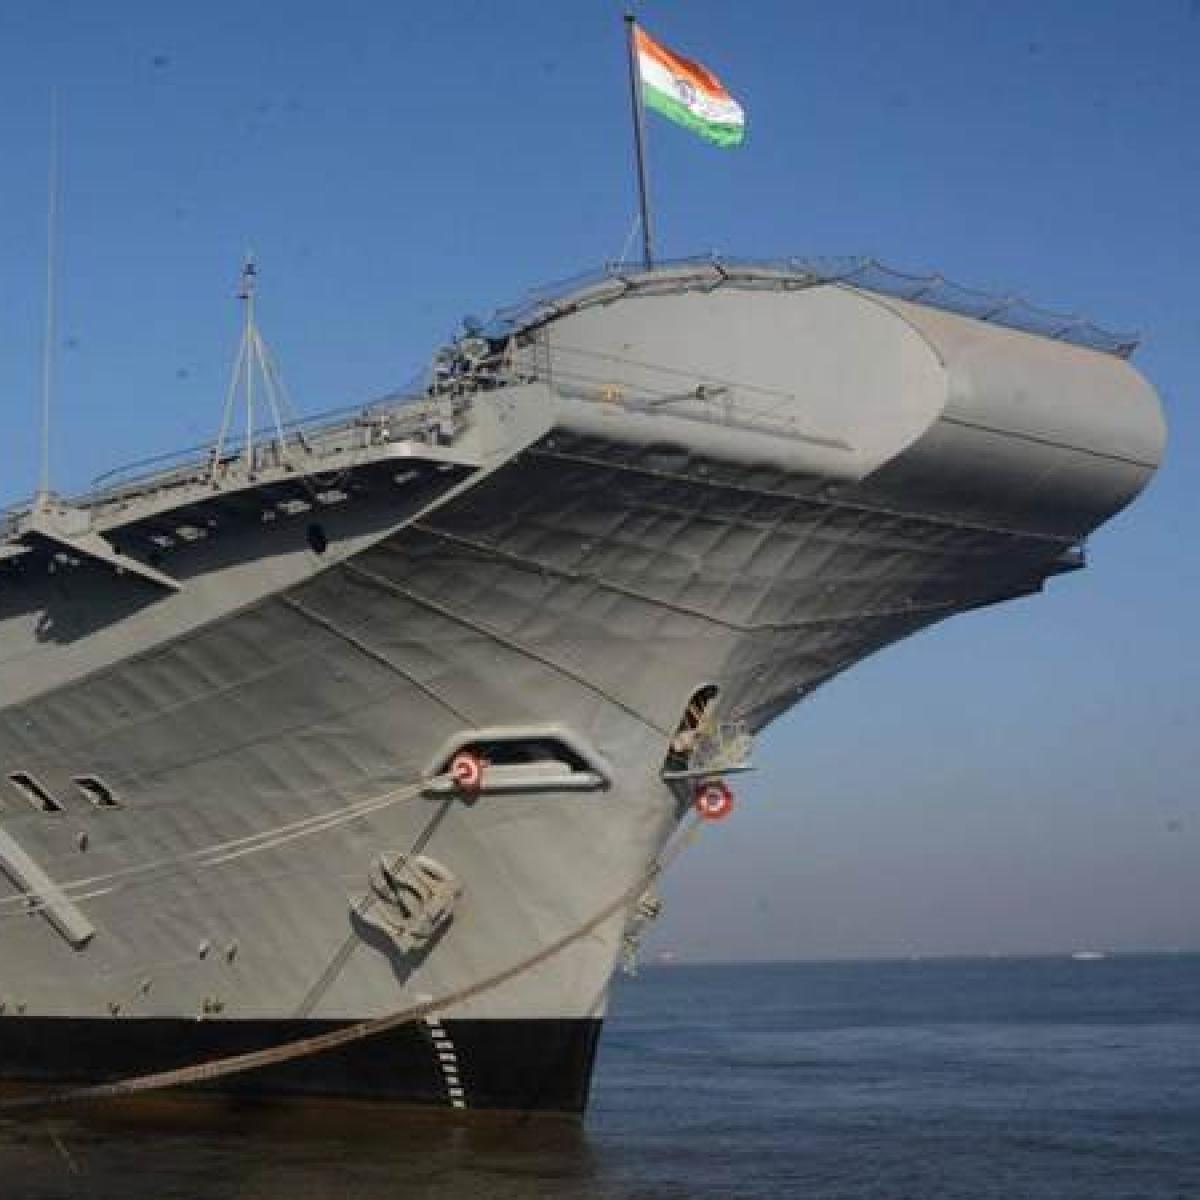 'Grant NOC to preserve INS Viraat': Shiv Sena MP Priyanka Chaturvedi writes to Defence Minister Rajnath Singh